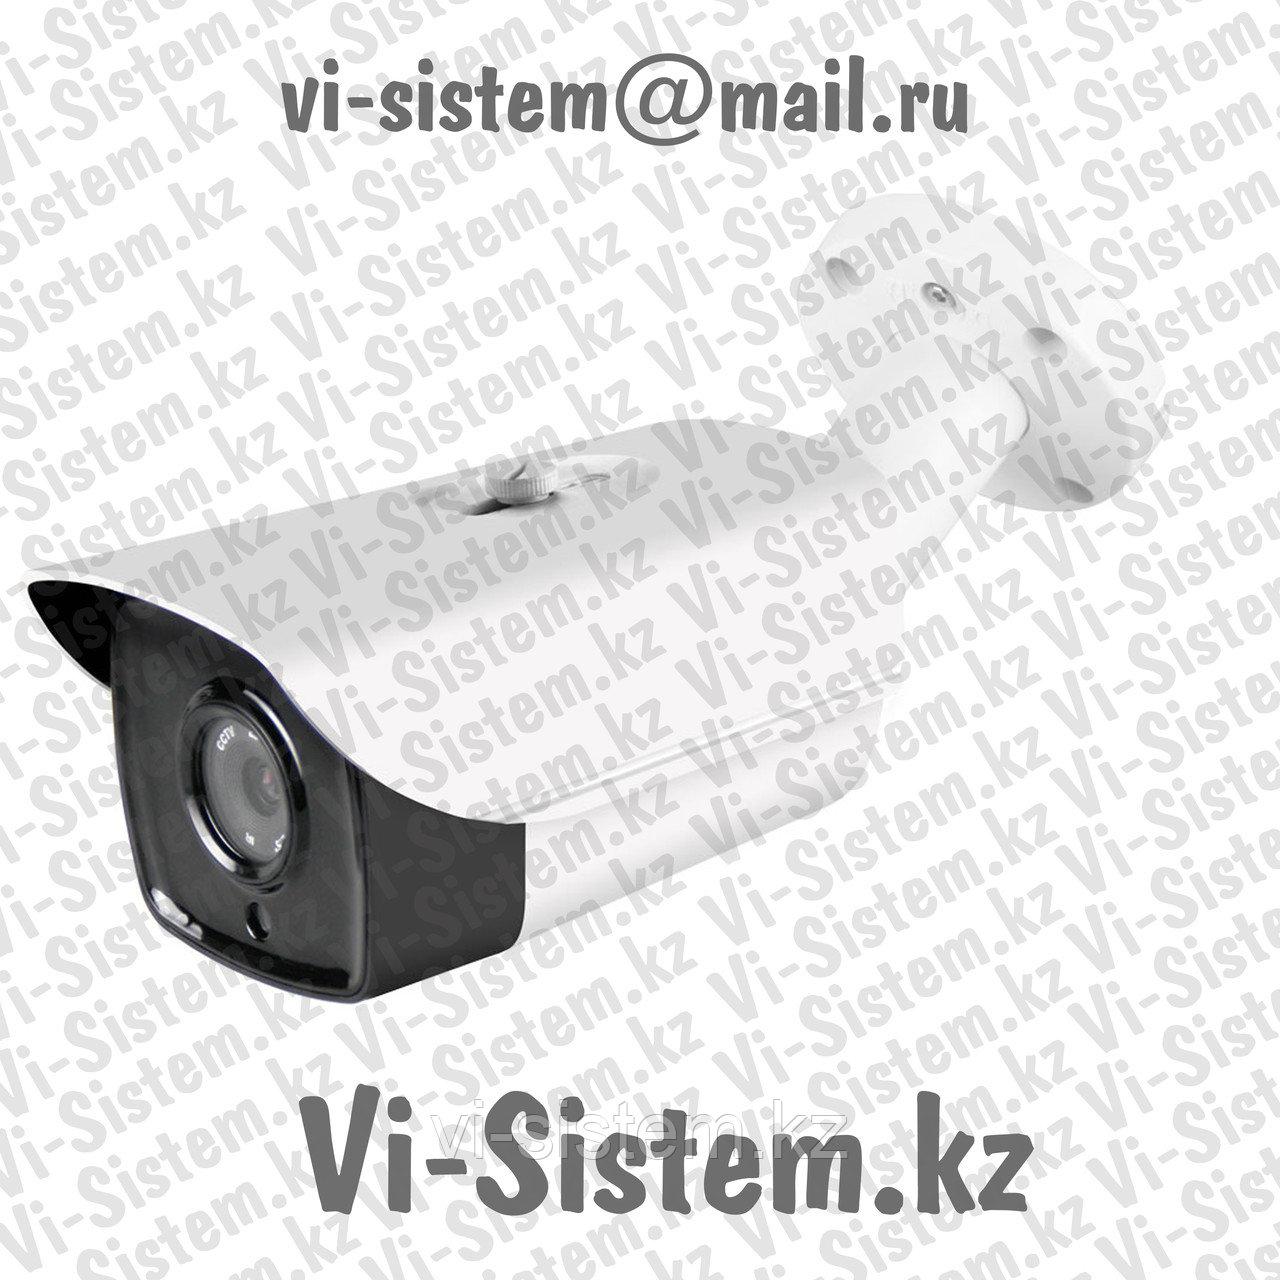 AHD-Видеокамера SYNCAR SY-893 2MP